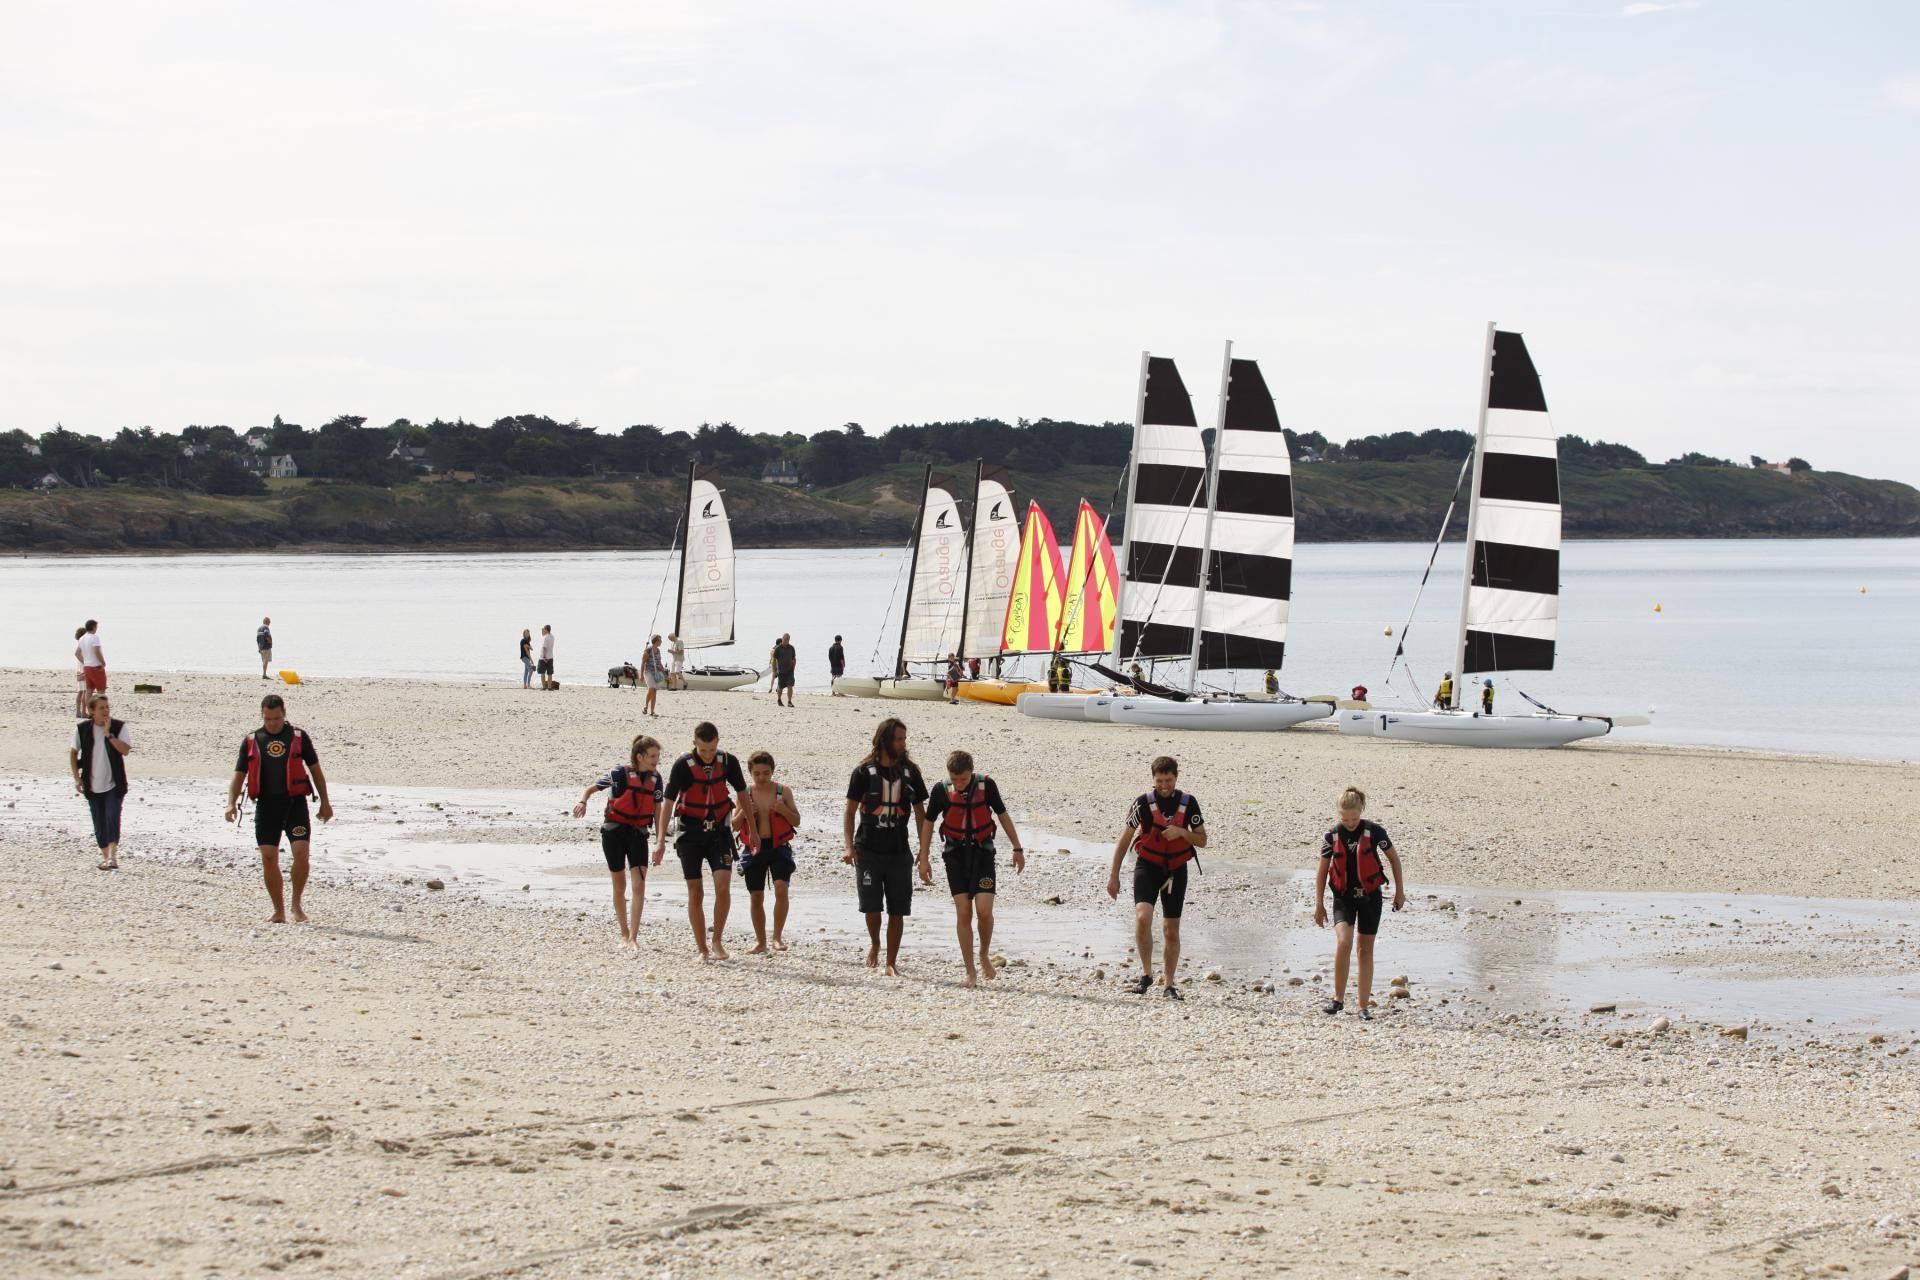 Club Nautique du Rohu - Sailing School in Brittany (Morbihan)